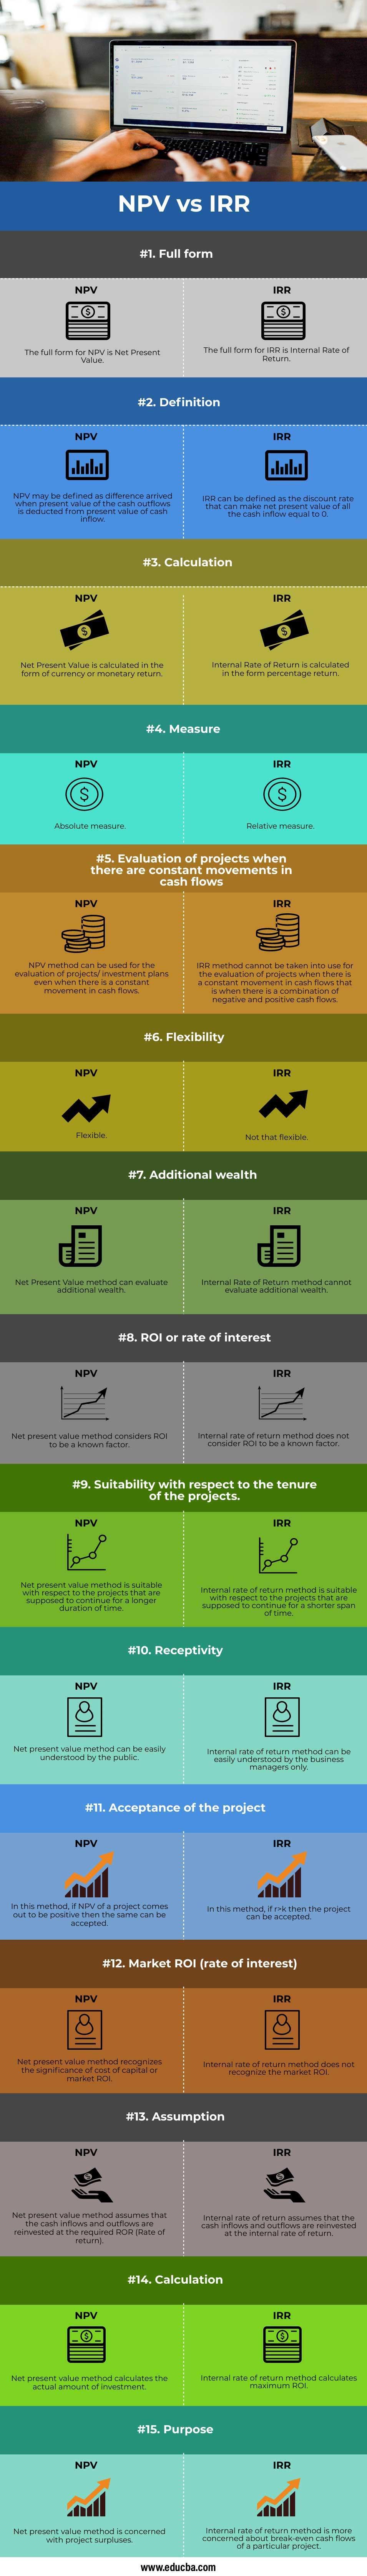 NPV-vs-IRR-info